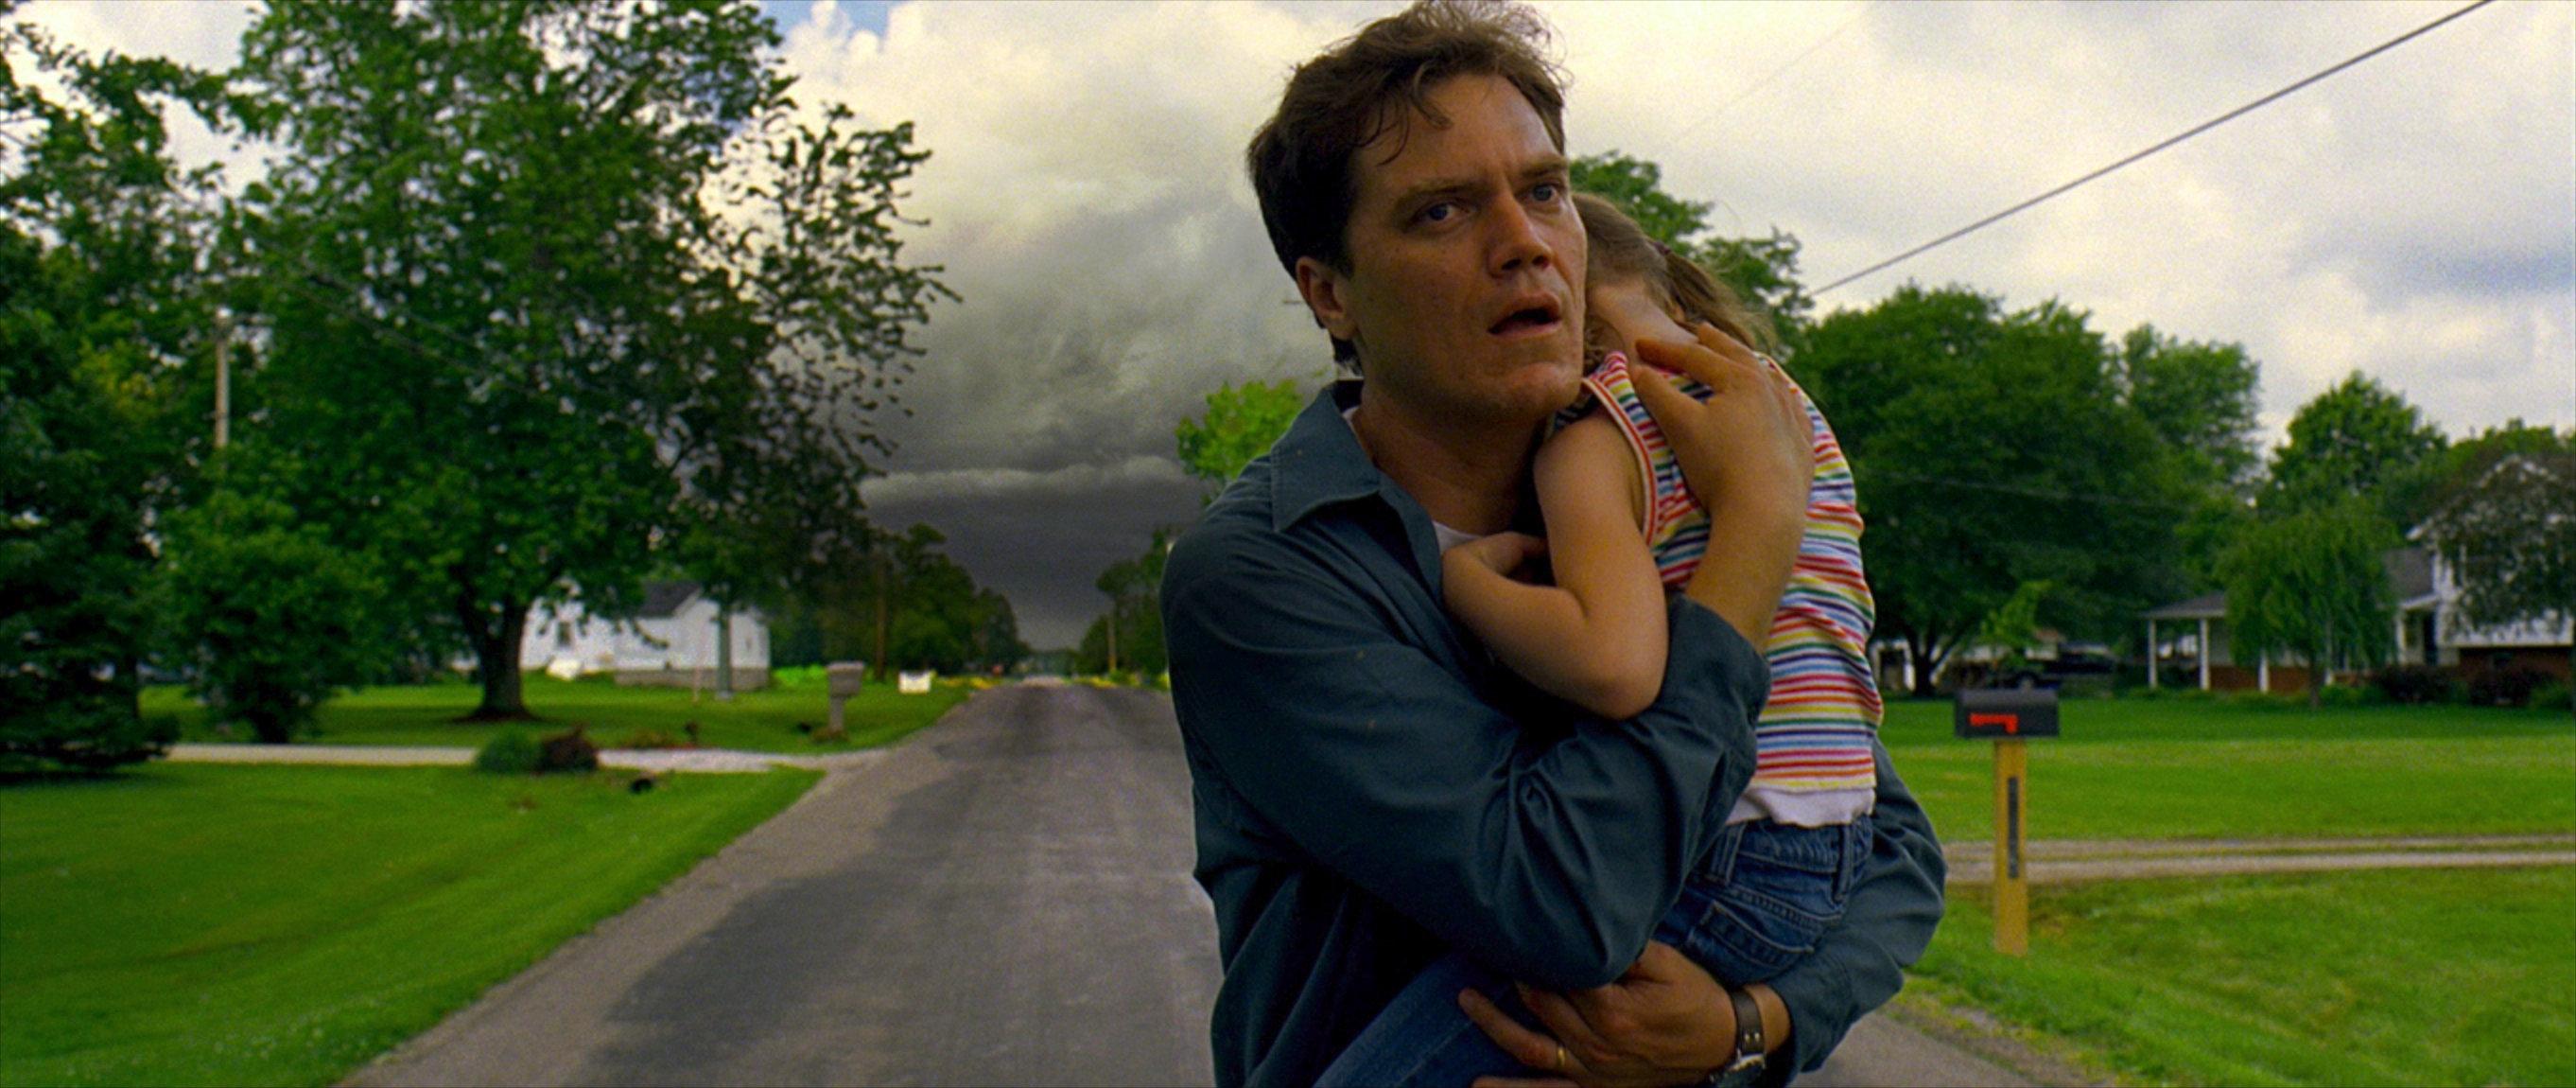 take-shelter-grab-the-kid